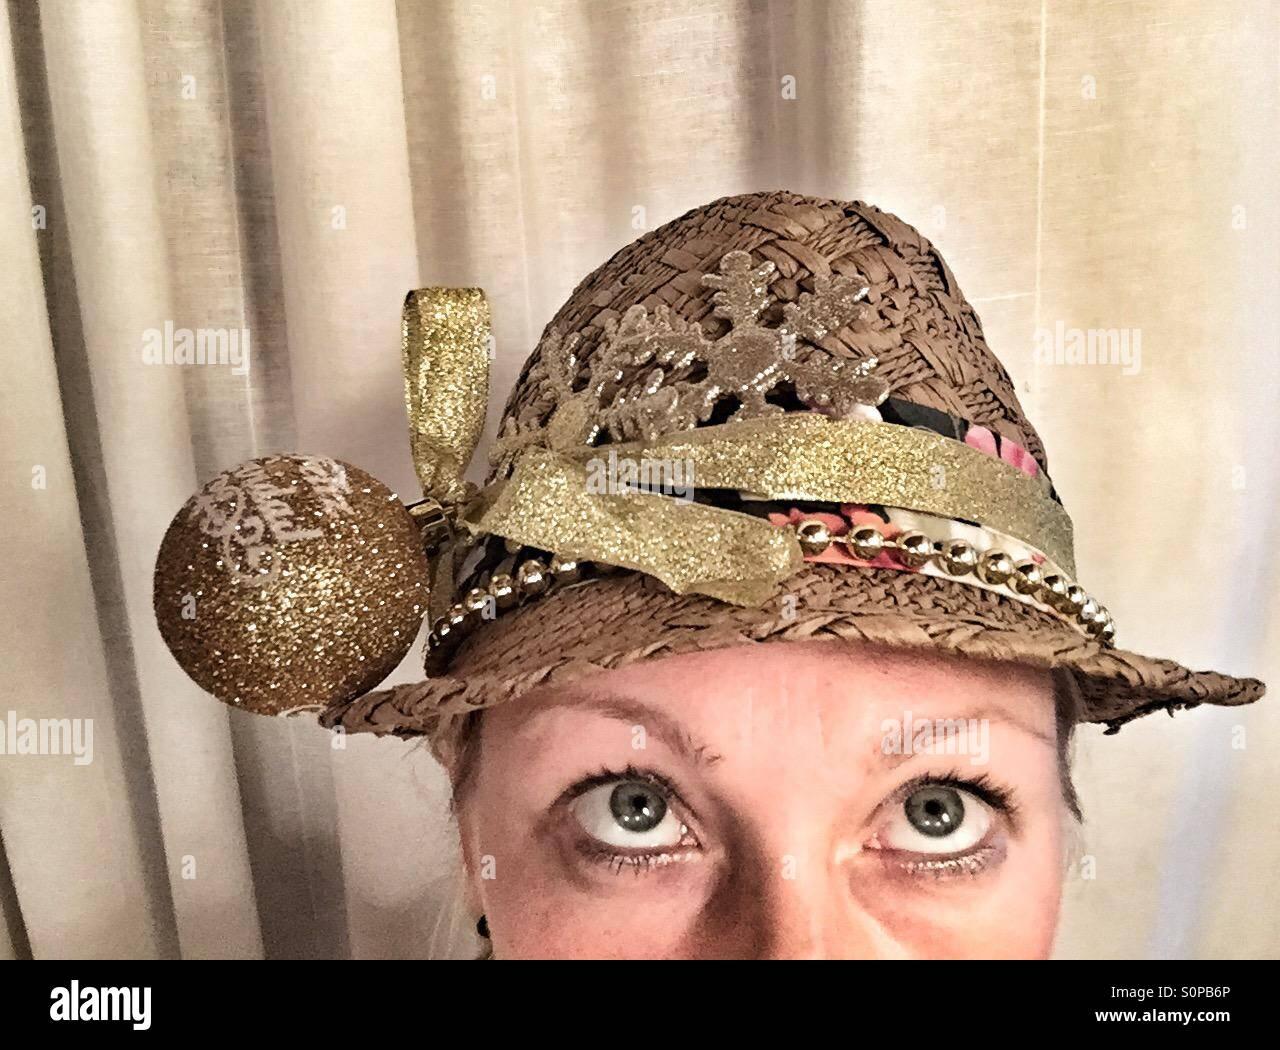 Christmas hat - Stock Image